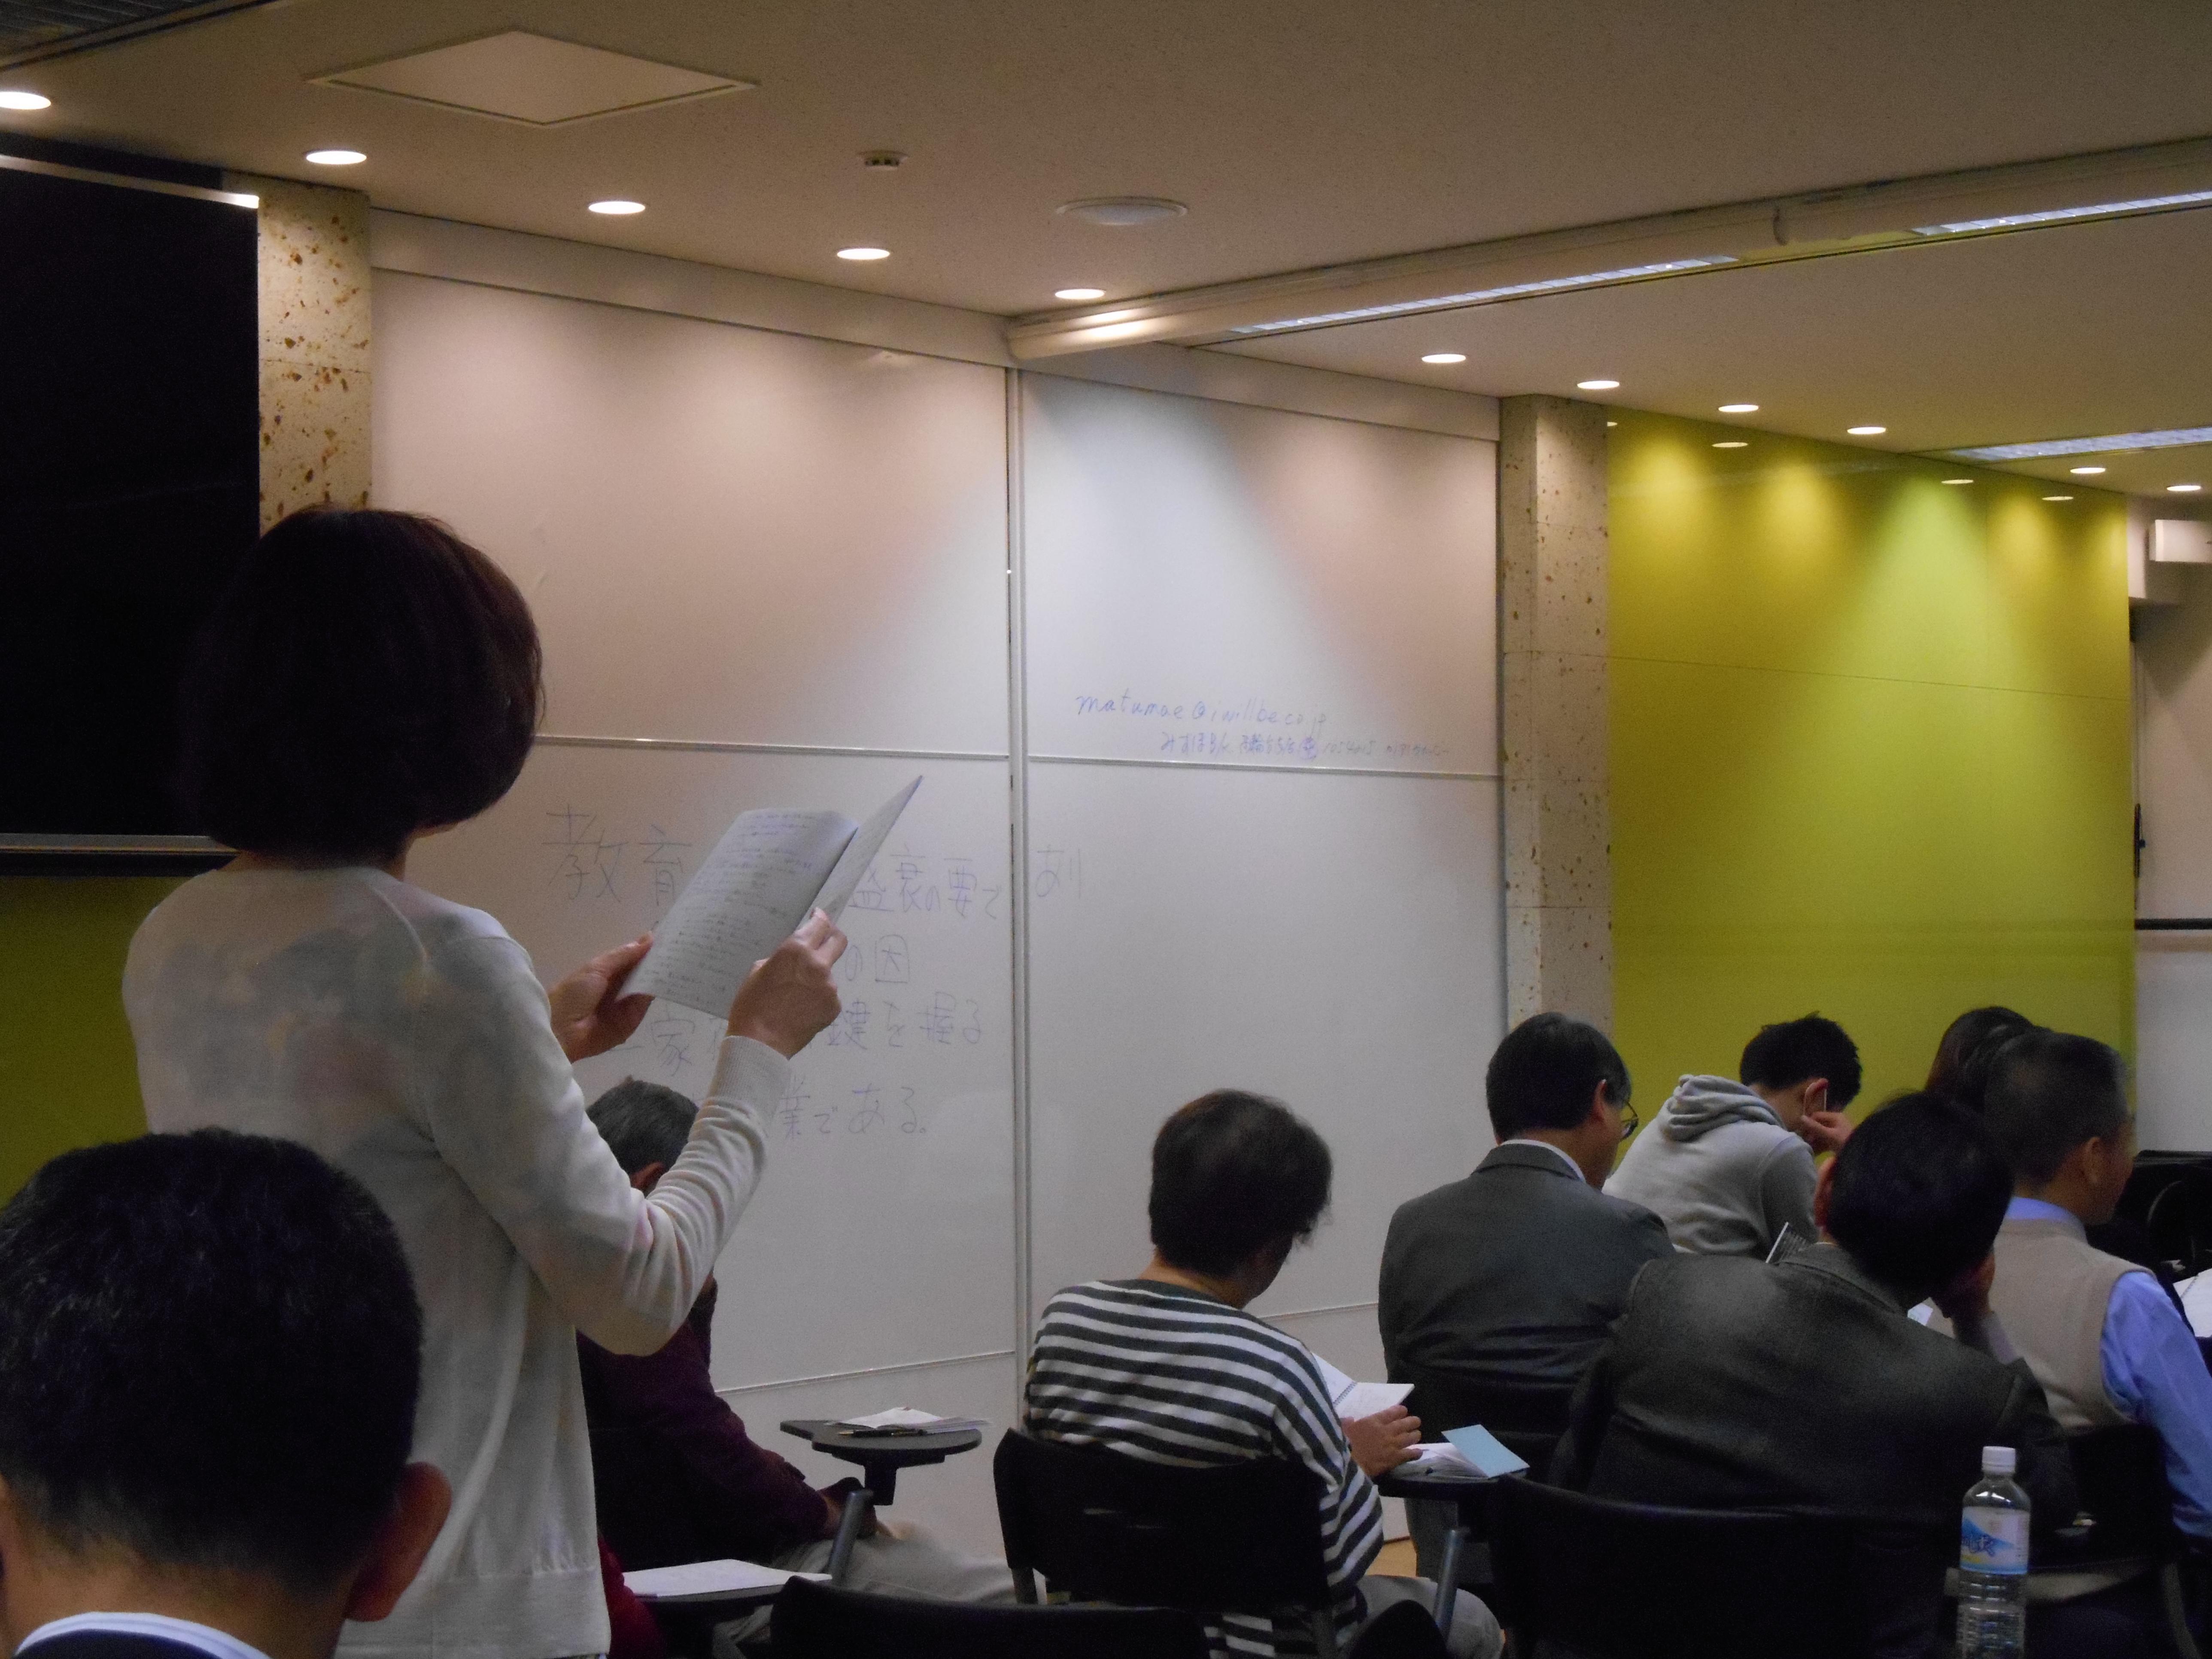 DSCN3730 - 2017年2月4日東京思風塾開催